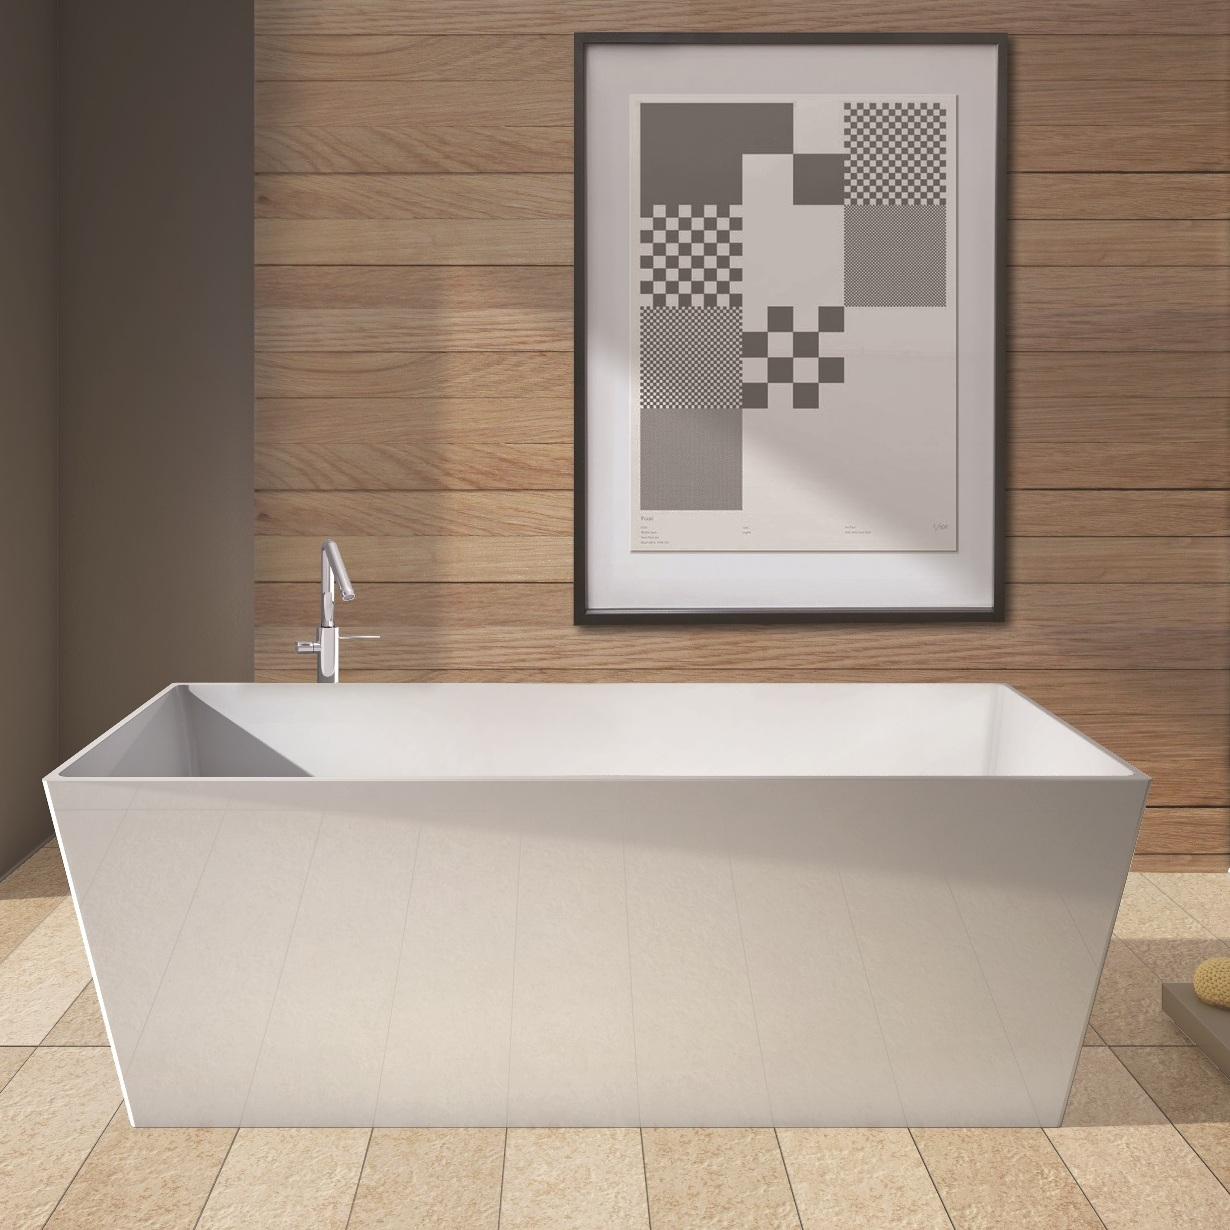 Vasca da bagno da design moderno quadra modello york in bianco lucido ebay - Vasca da bagno quadrata ...